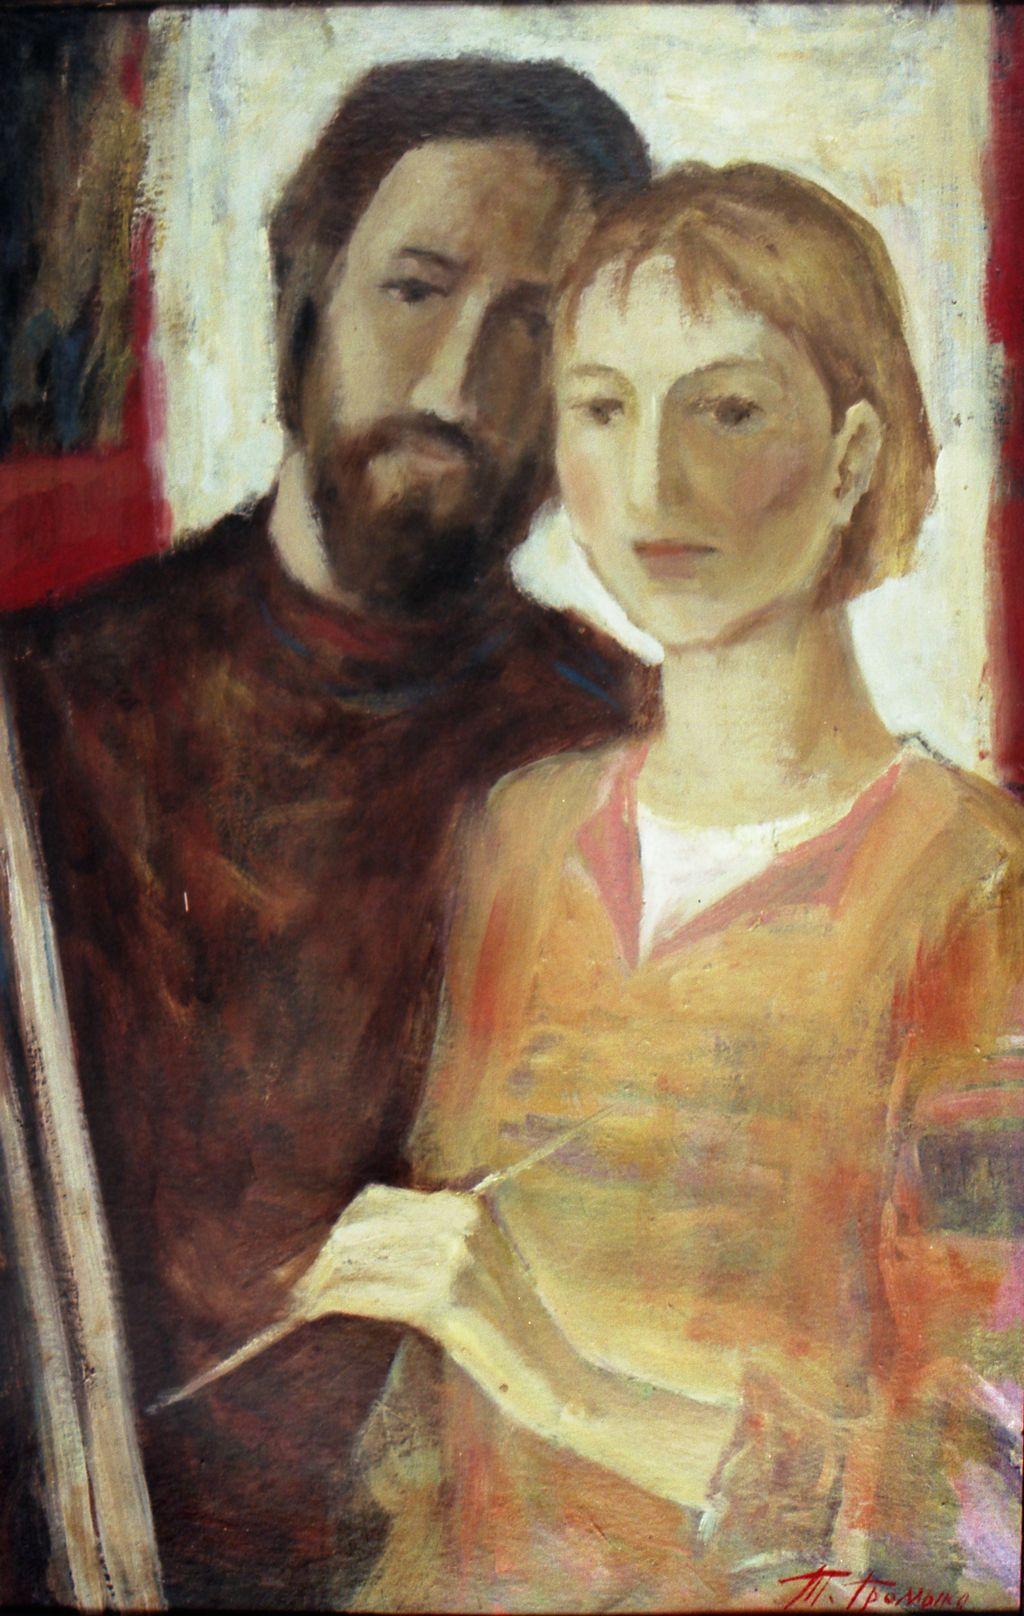 Tatyana Matveyevna Gromyko. Together. Self-portrait with her husband.